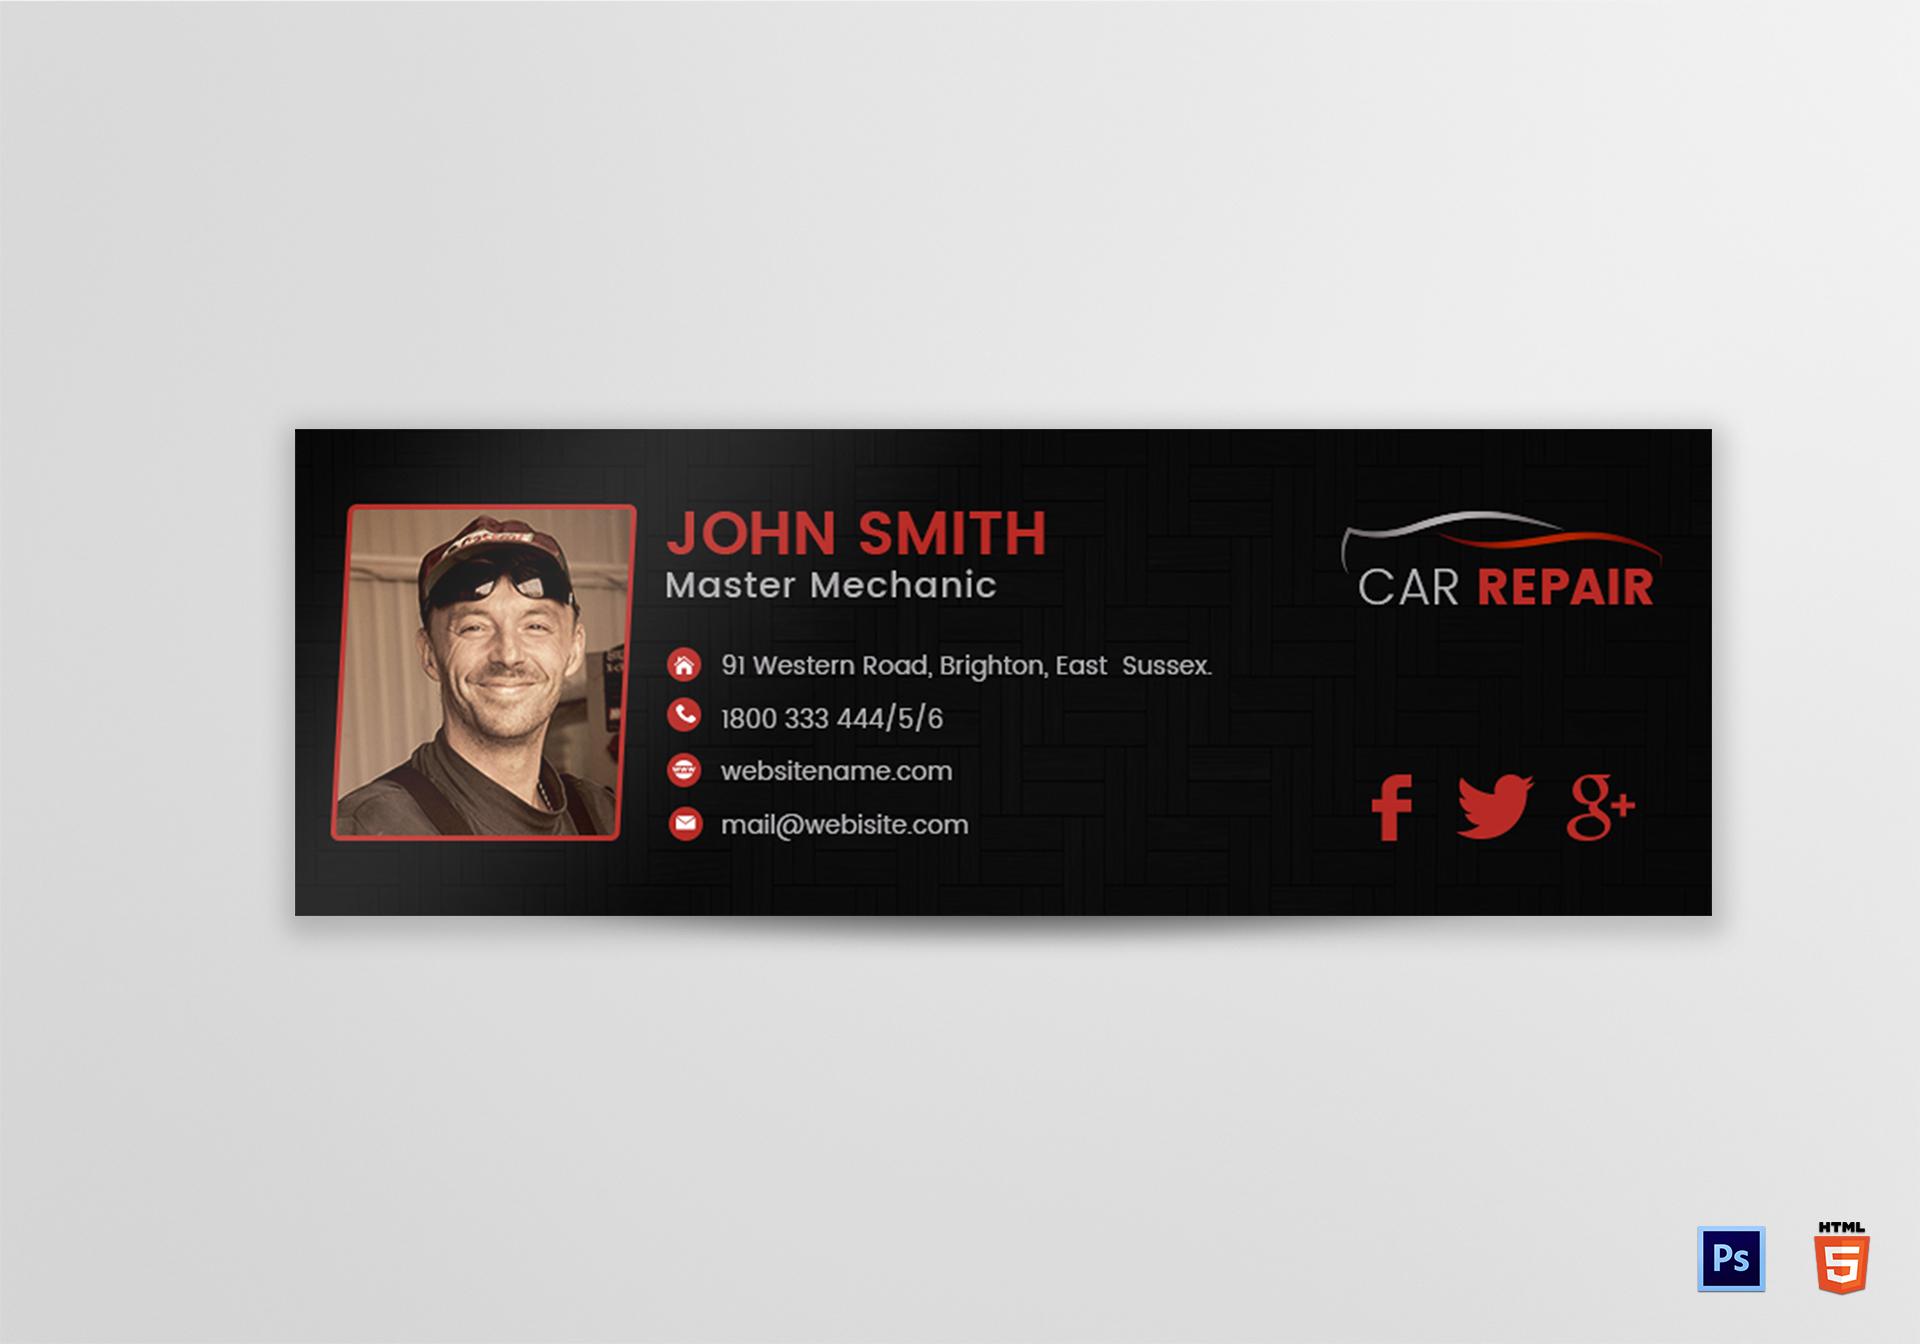 Car Repair Email Signature